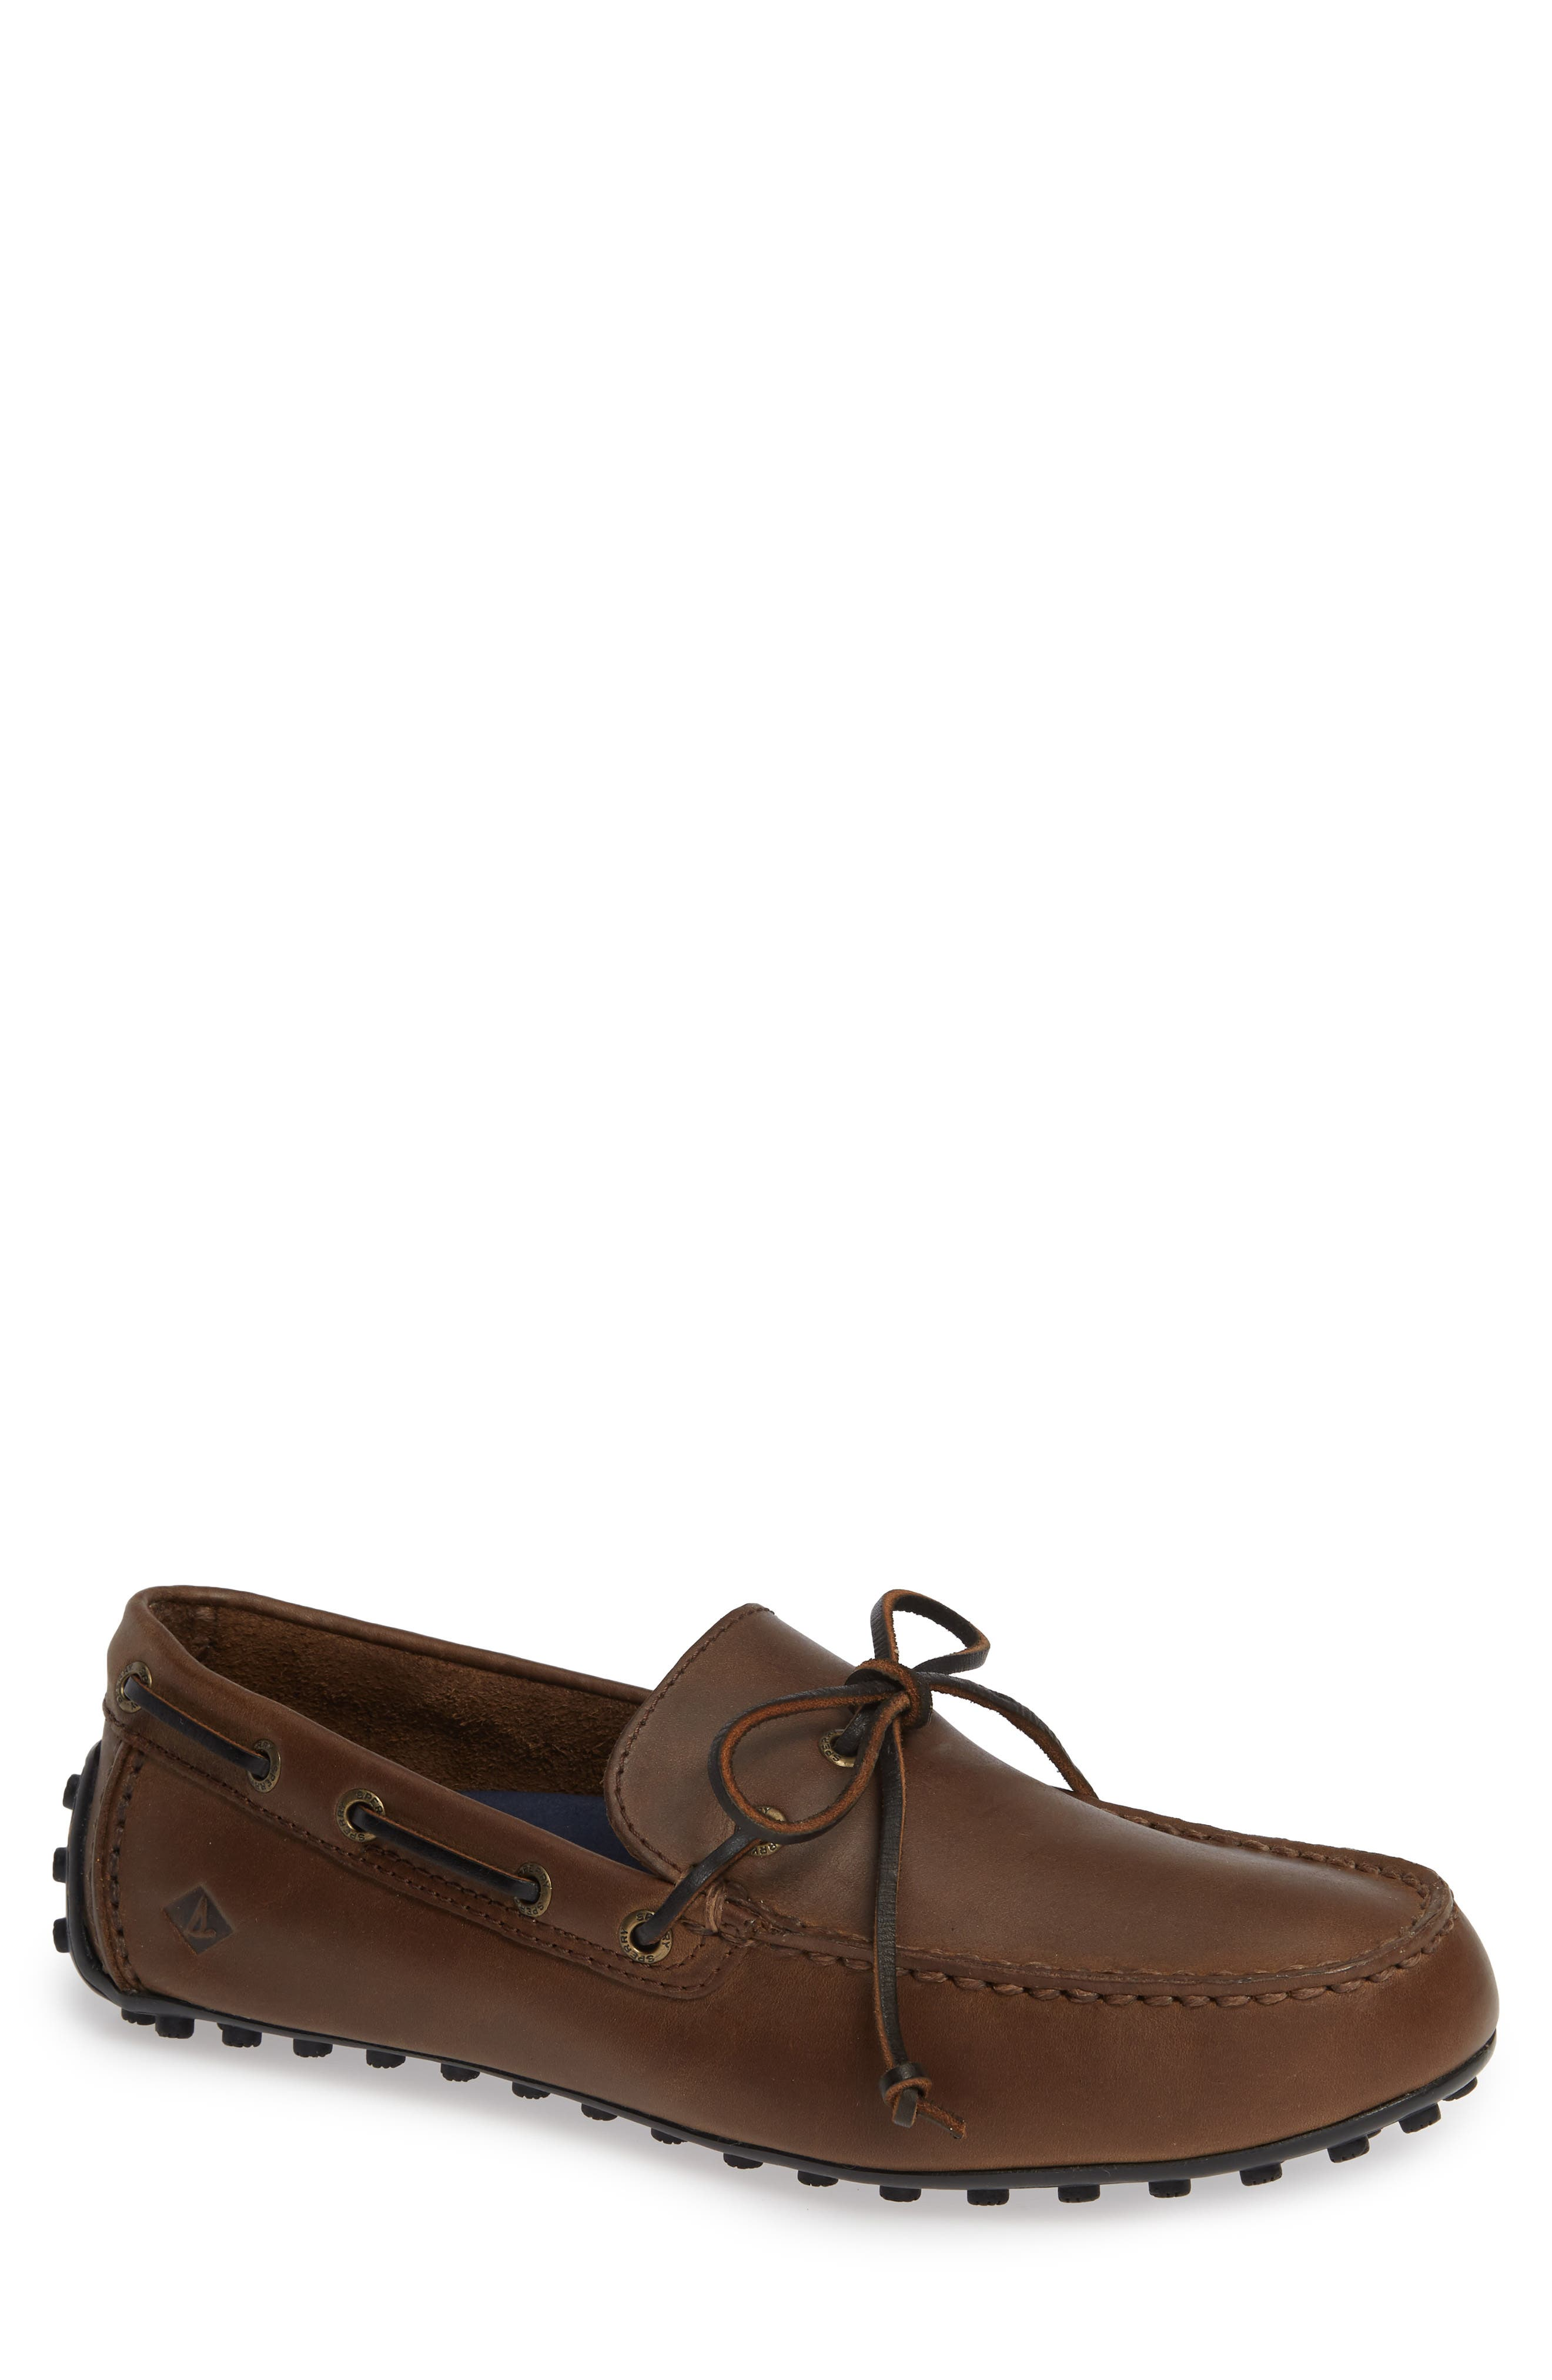 SPERRY Hamilton II Driving Shoe, Main, color, DARK BROWN